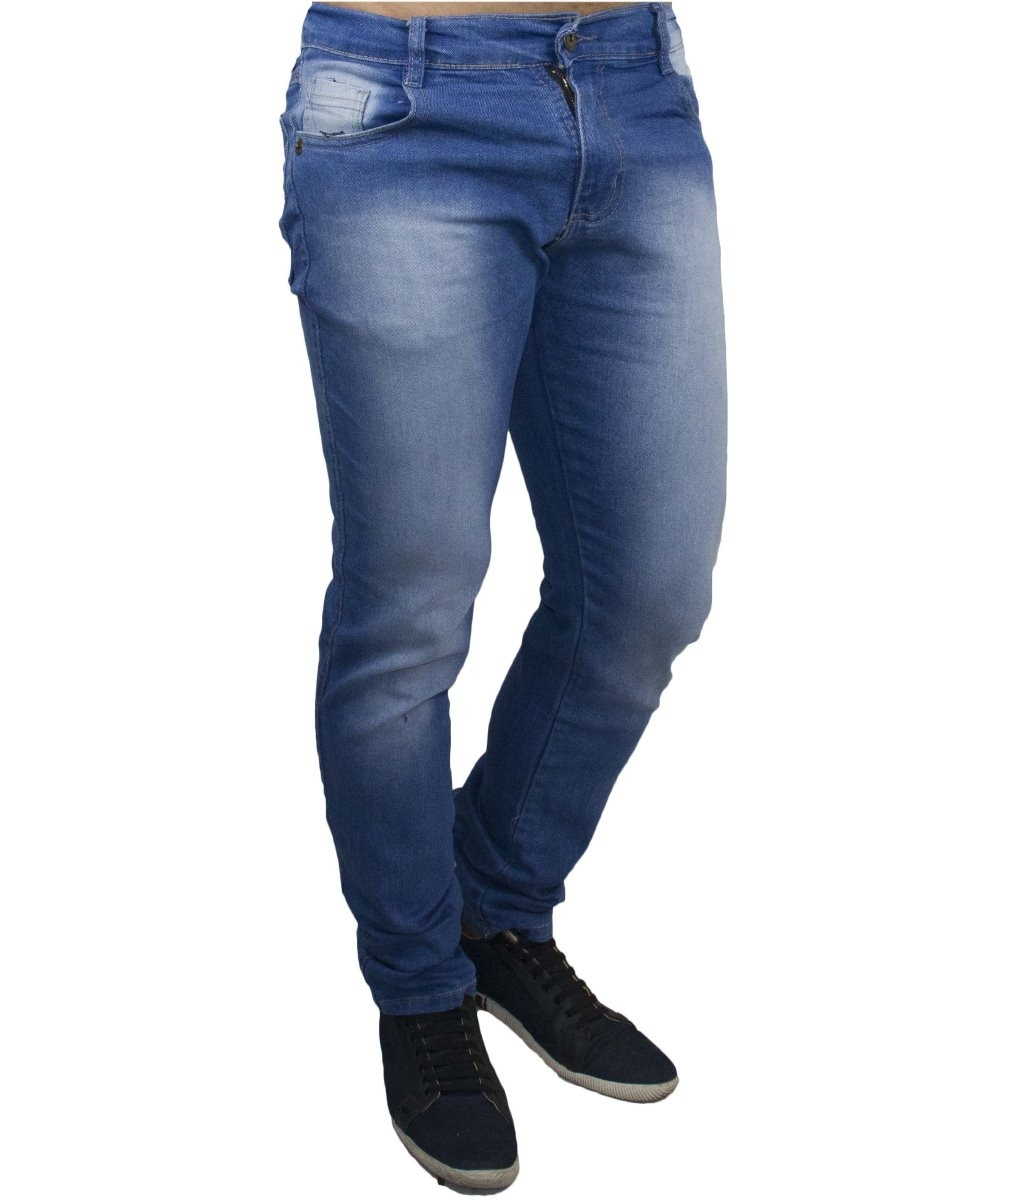 c794cf996 kit c  3 calça jeans sarja masculina skinny lycra colorida. Carregando zoom.